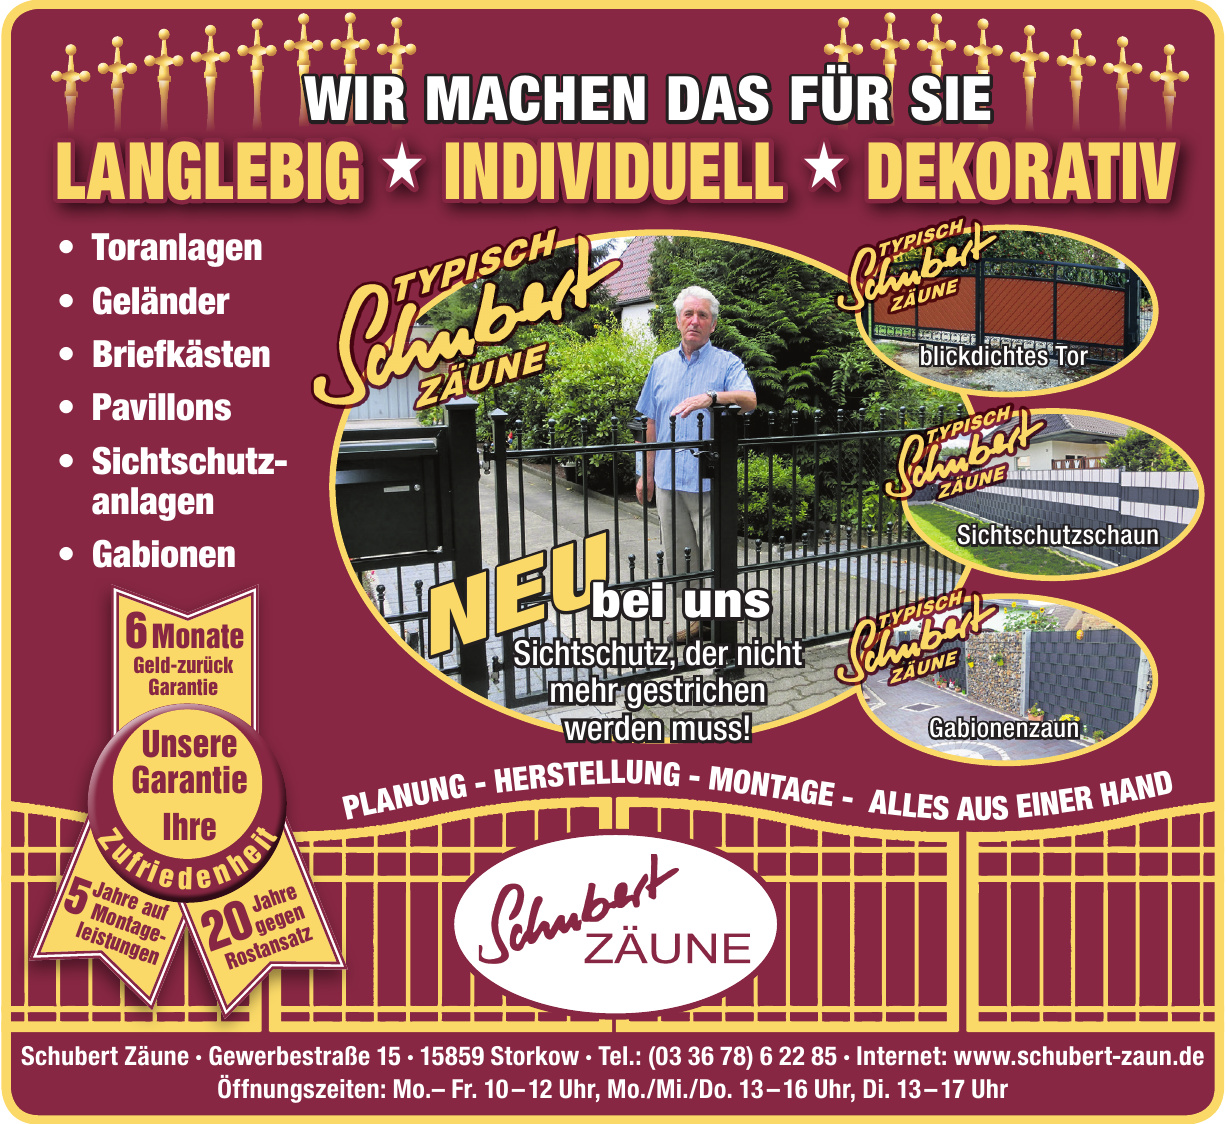 Schubert Zäune